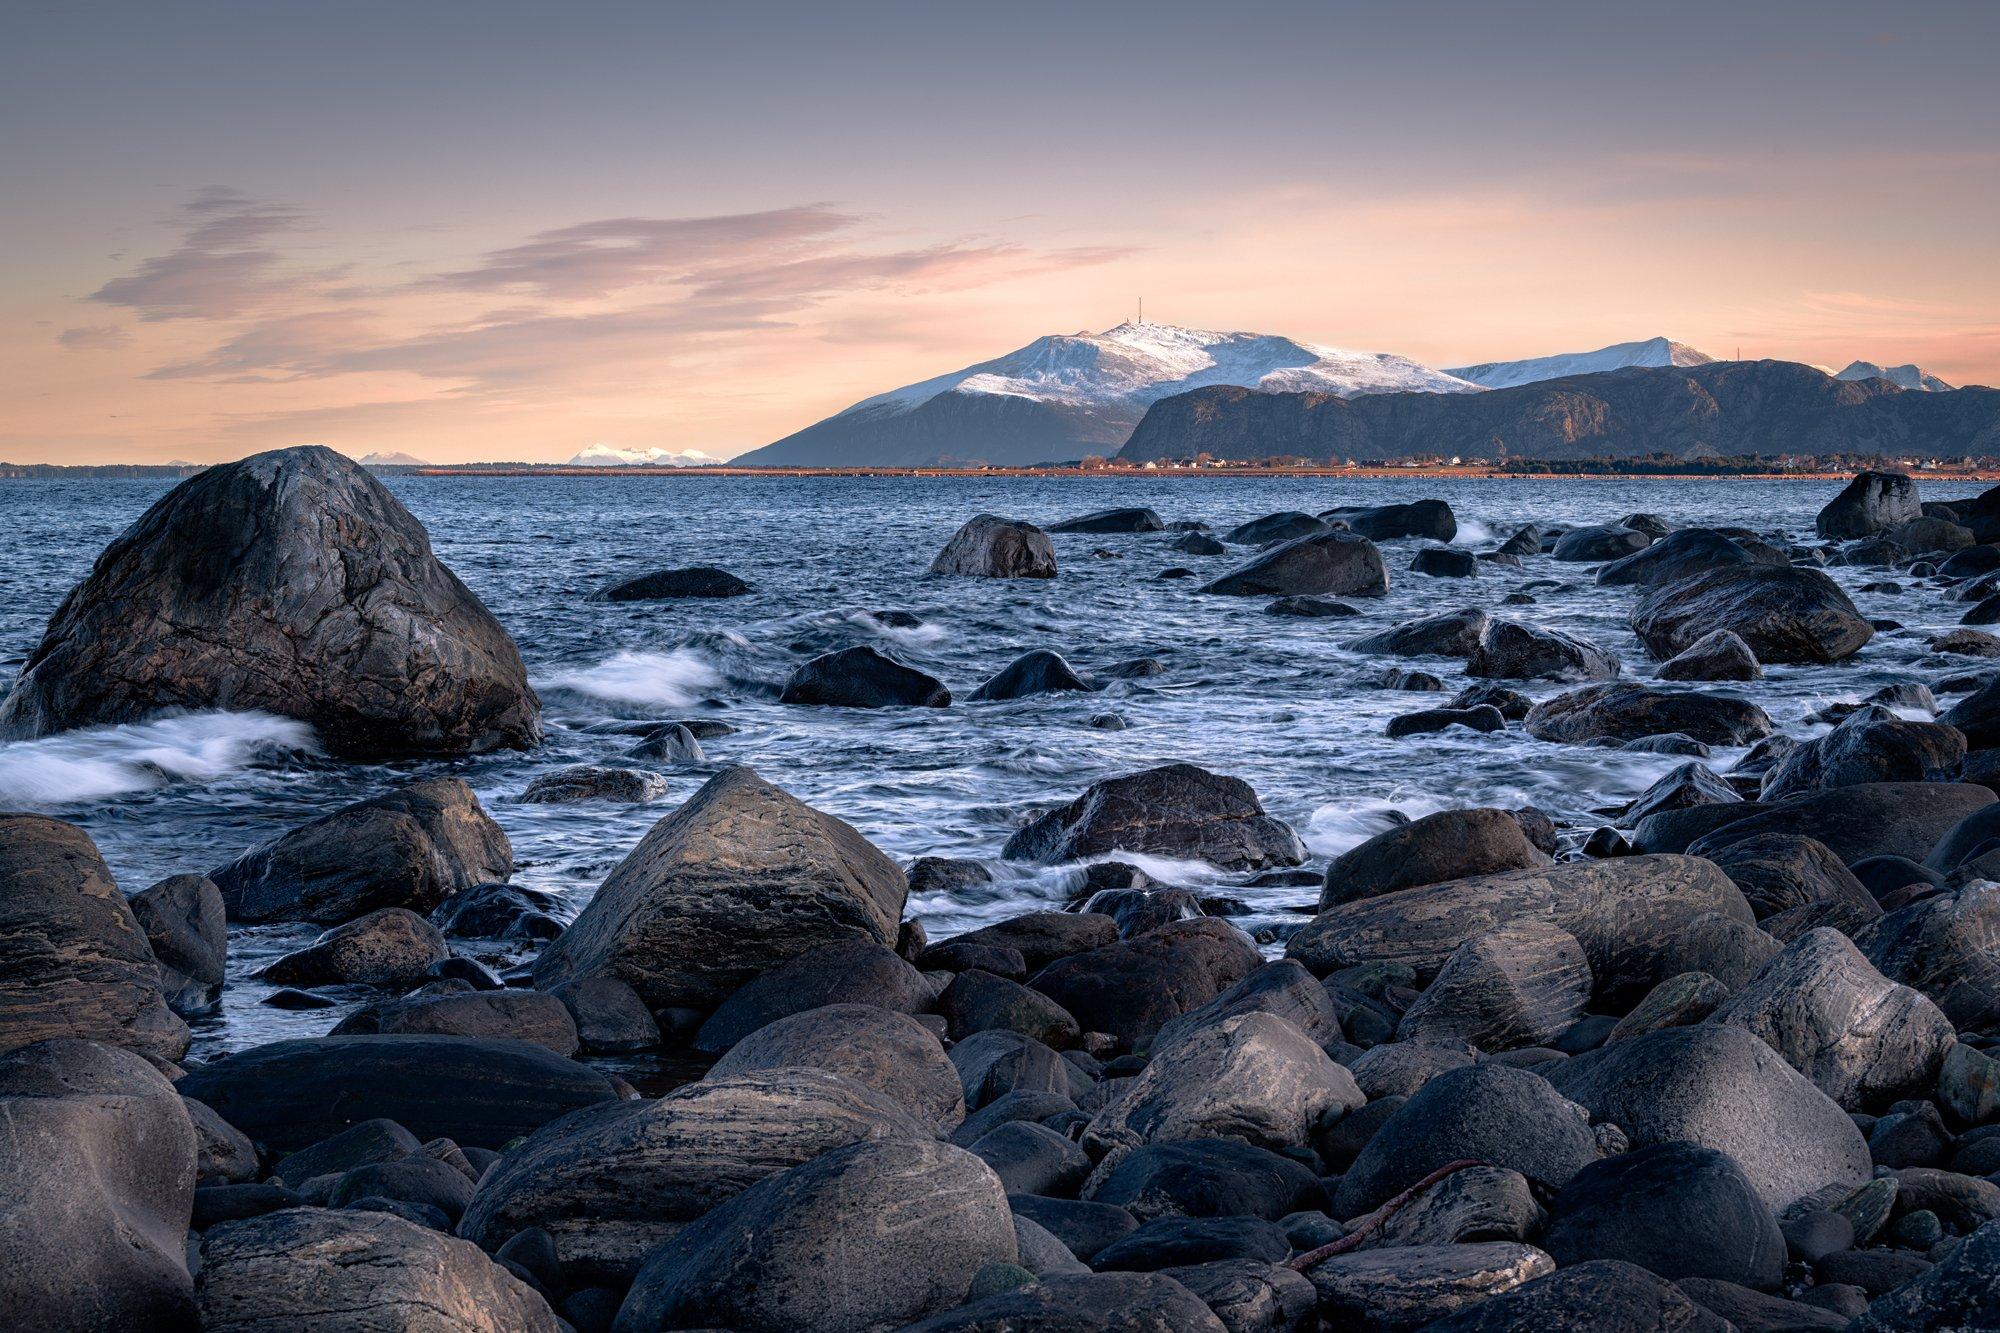 landscape, norway, fjord, nature, rocks, nikon, sea, mountain, water, sunset, colors, Imiełowski Grzegorz